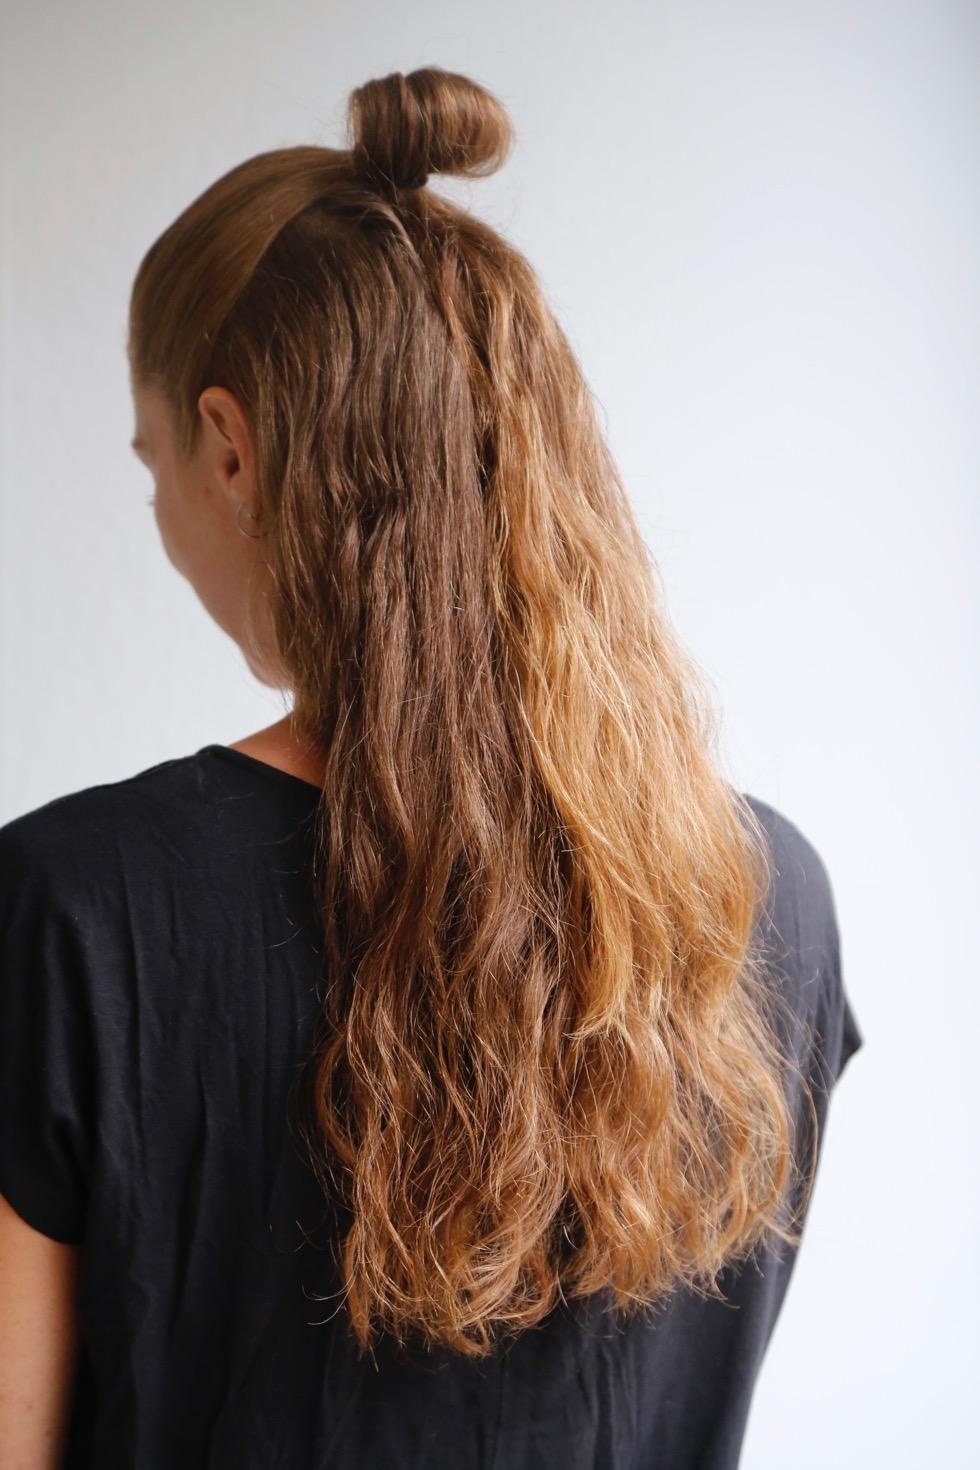 Vegansk hårfarve Maria Nila ingen skadelig kemi Christine Bonde blog - 1